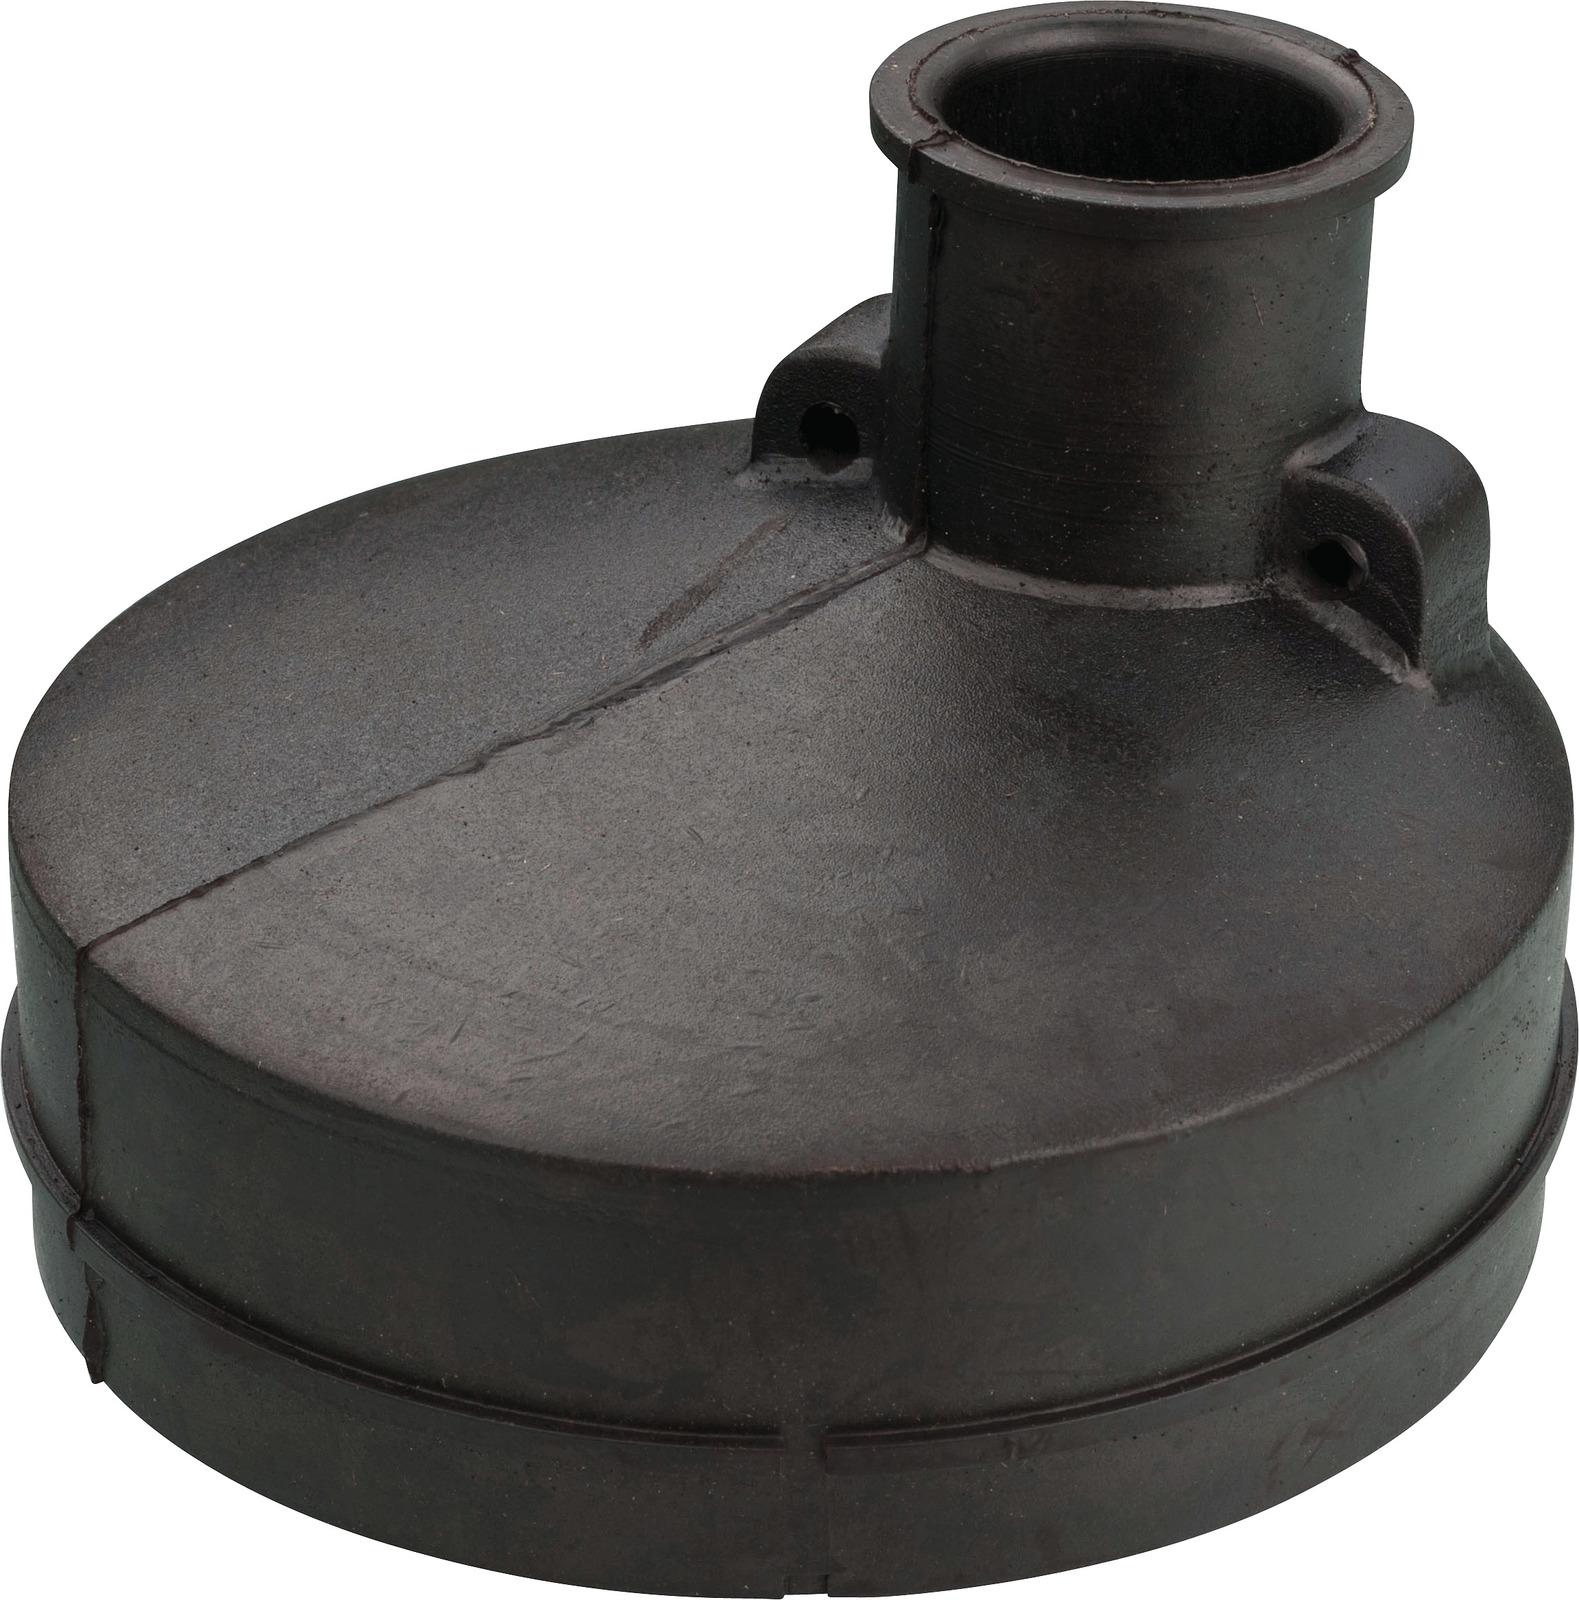 Schelle Ölabscheider Unten Oben Oil Separator Clamp SR500 XT500 OEM 90460-22083